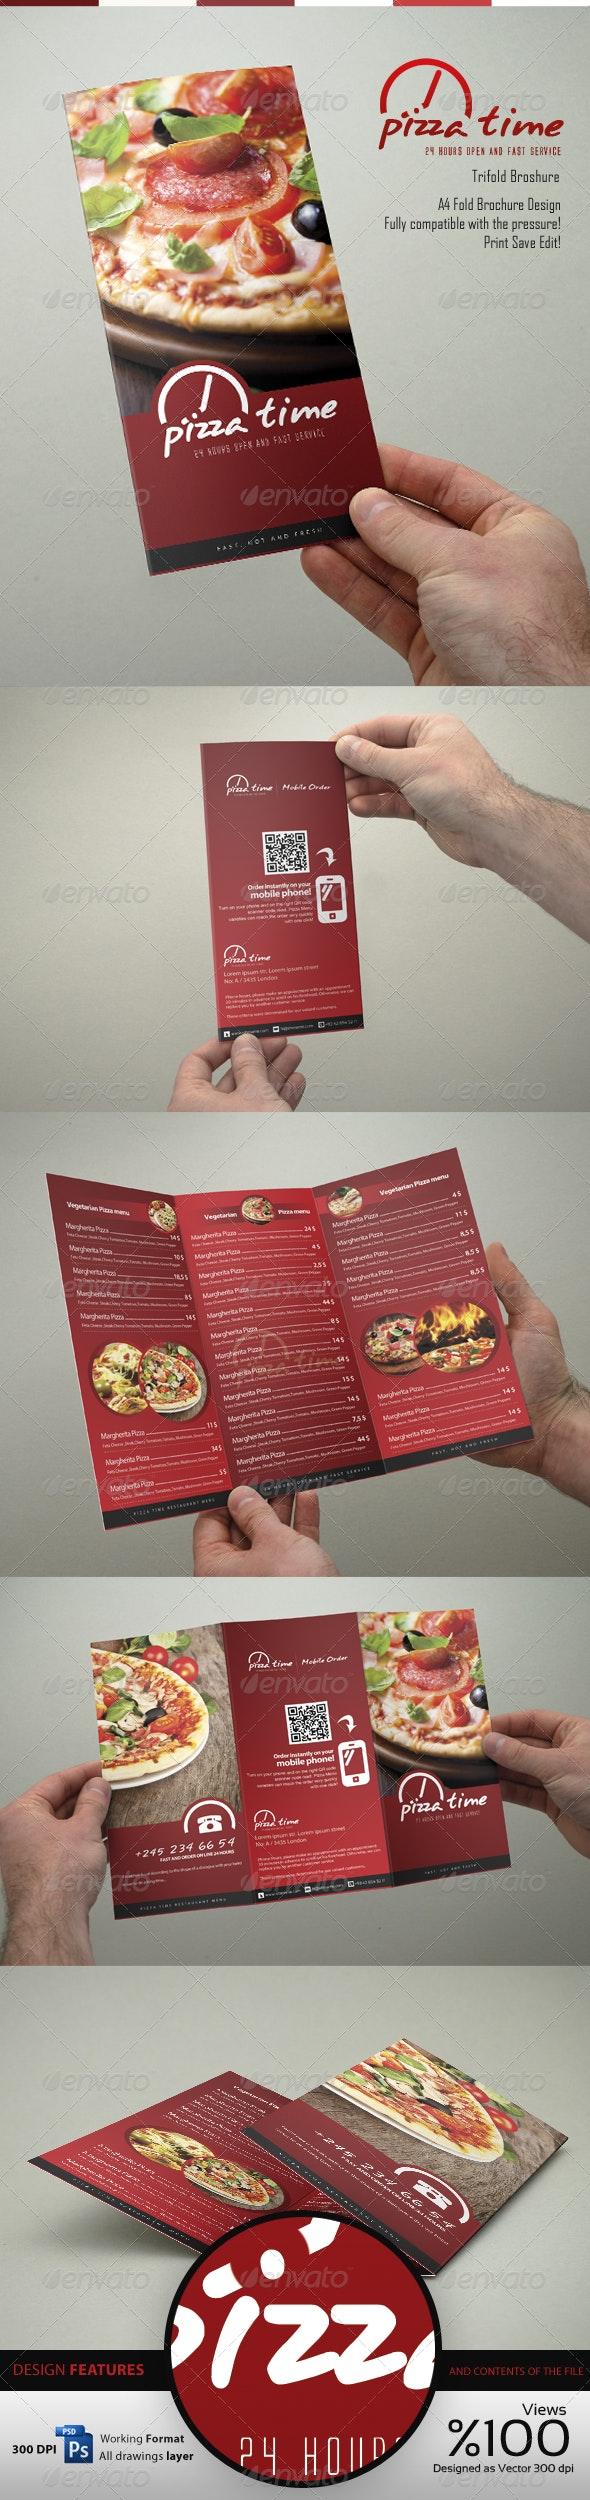 Food Menu Trifold Broshure V1 - Brochures Print Templates